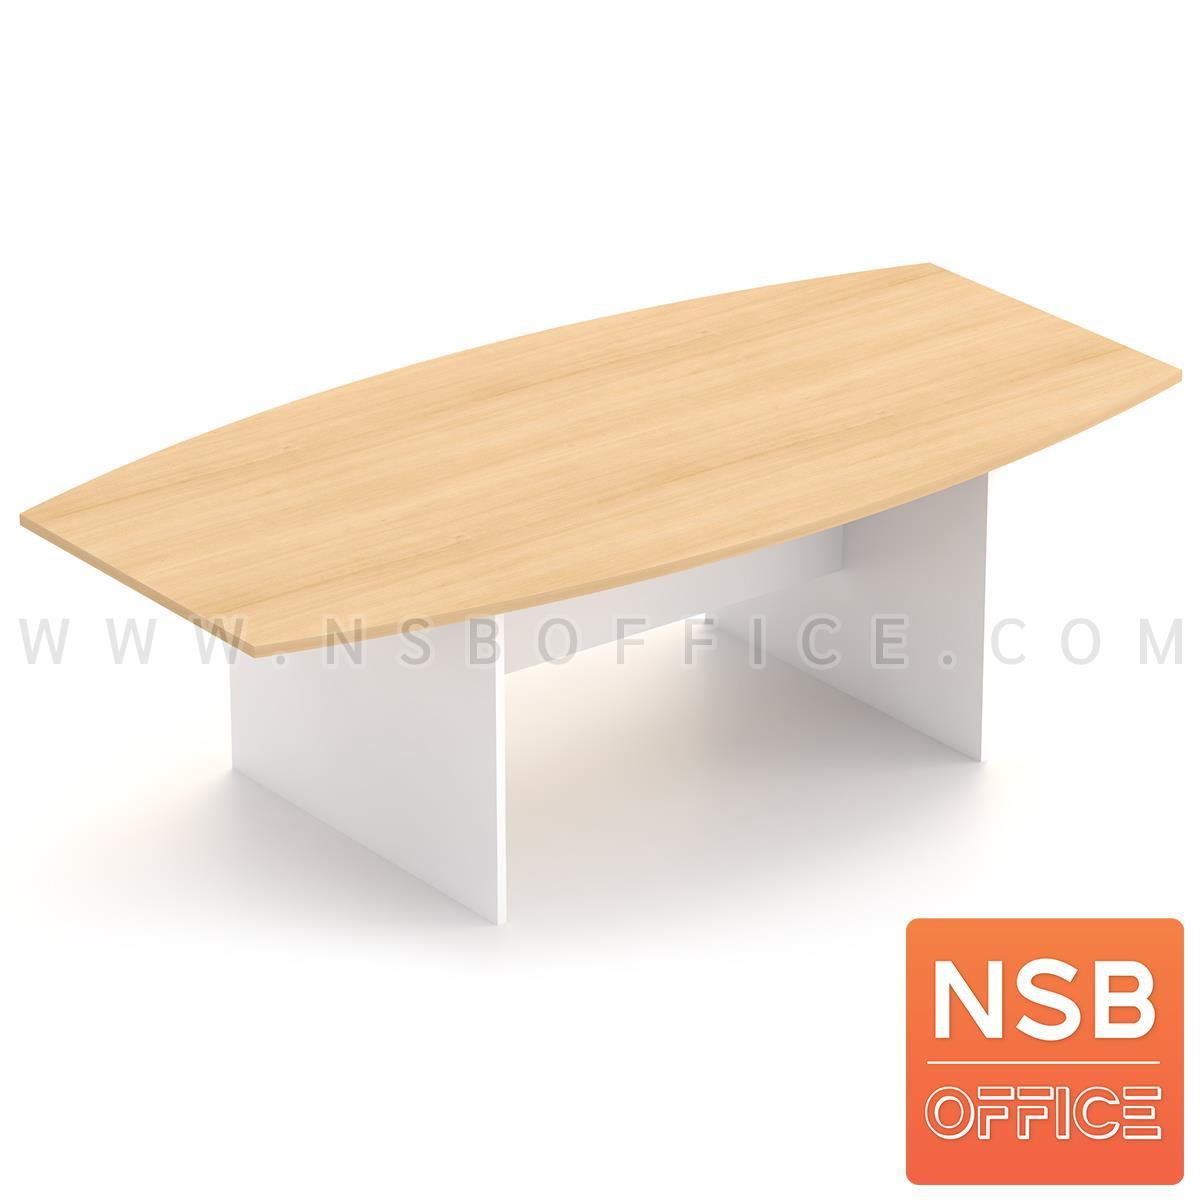 A05A097:โต๊ะประชุมทรงเรือ  รุ่น Tyrese (ไทรีส) 6 ,10 ที่นั่ง ขนาด 180W ,240W cm. ขาไม้